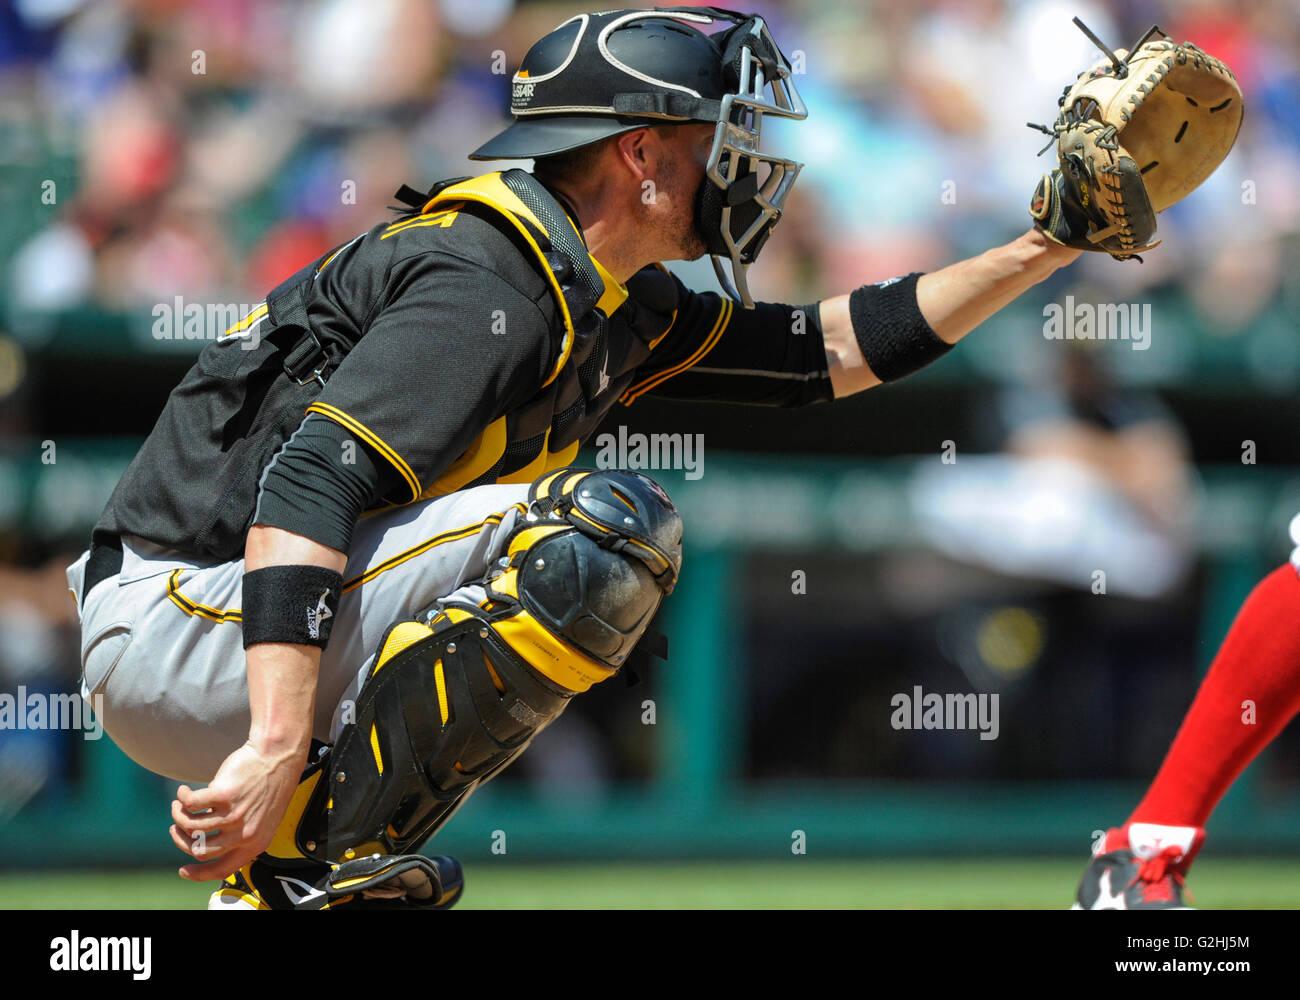 Mayo 29, 2016: Pittsburgh Pirates catcher Chris Stewart #19 durante un juego MLB entre los Piratas de Pittsburgh Imagen De Stock